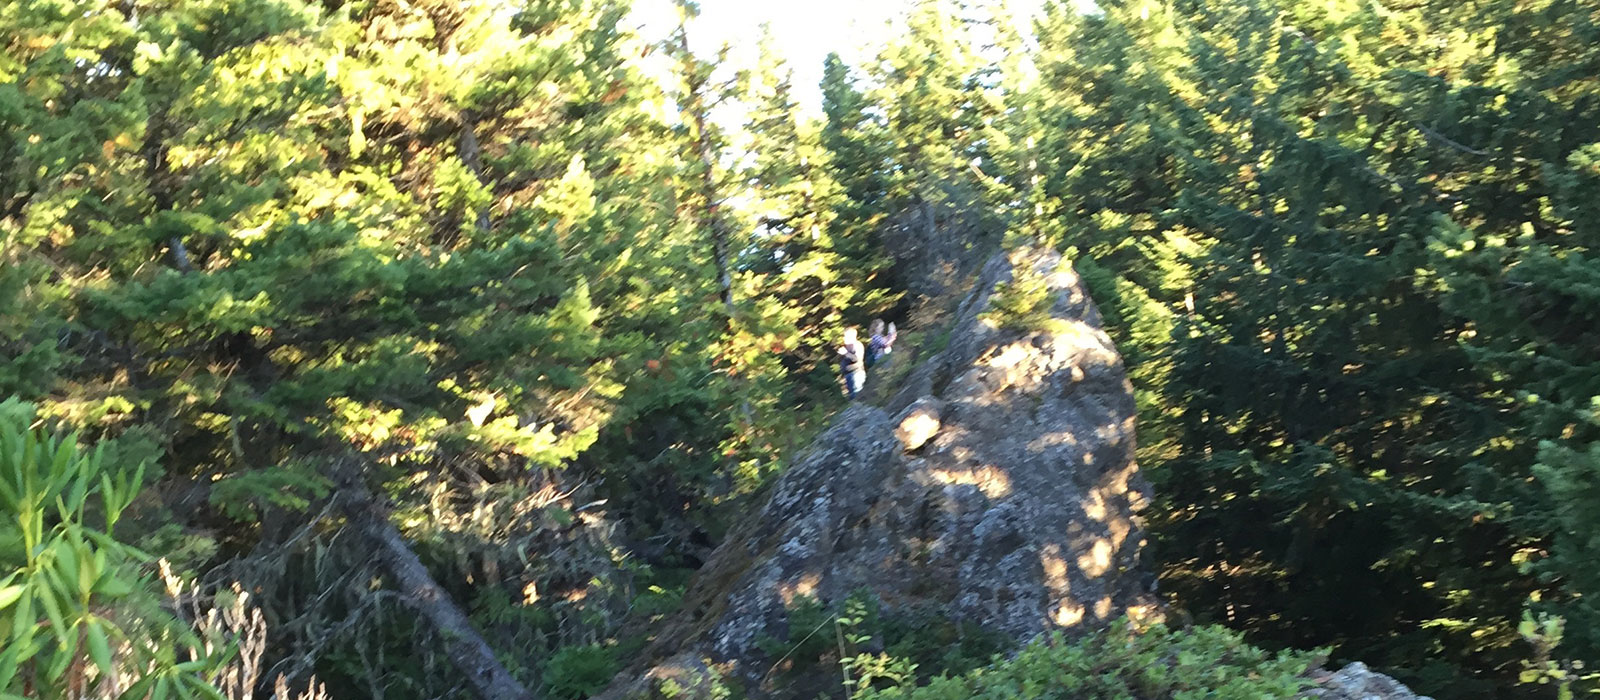 Prayer Time on Mount Zion, 2015 – Olympia National Park, WA